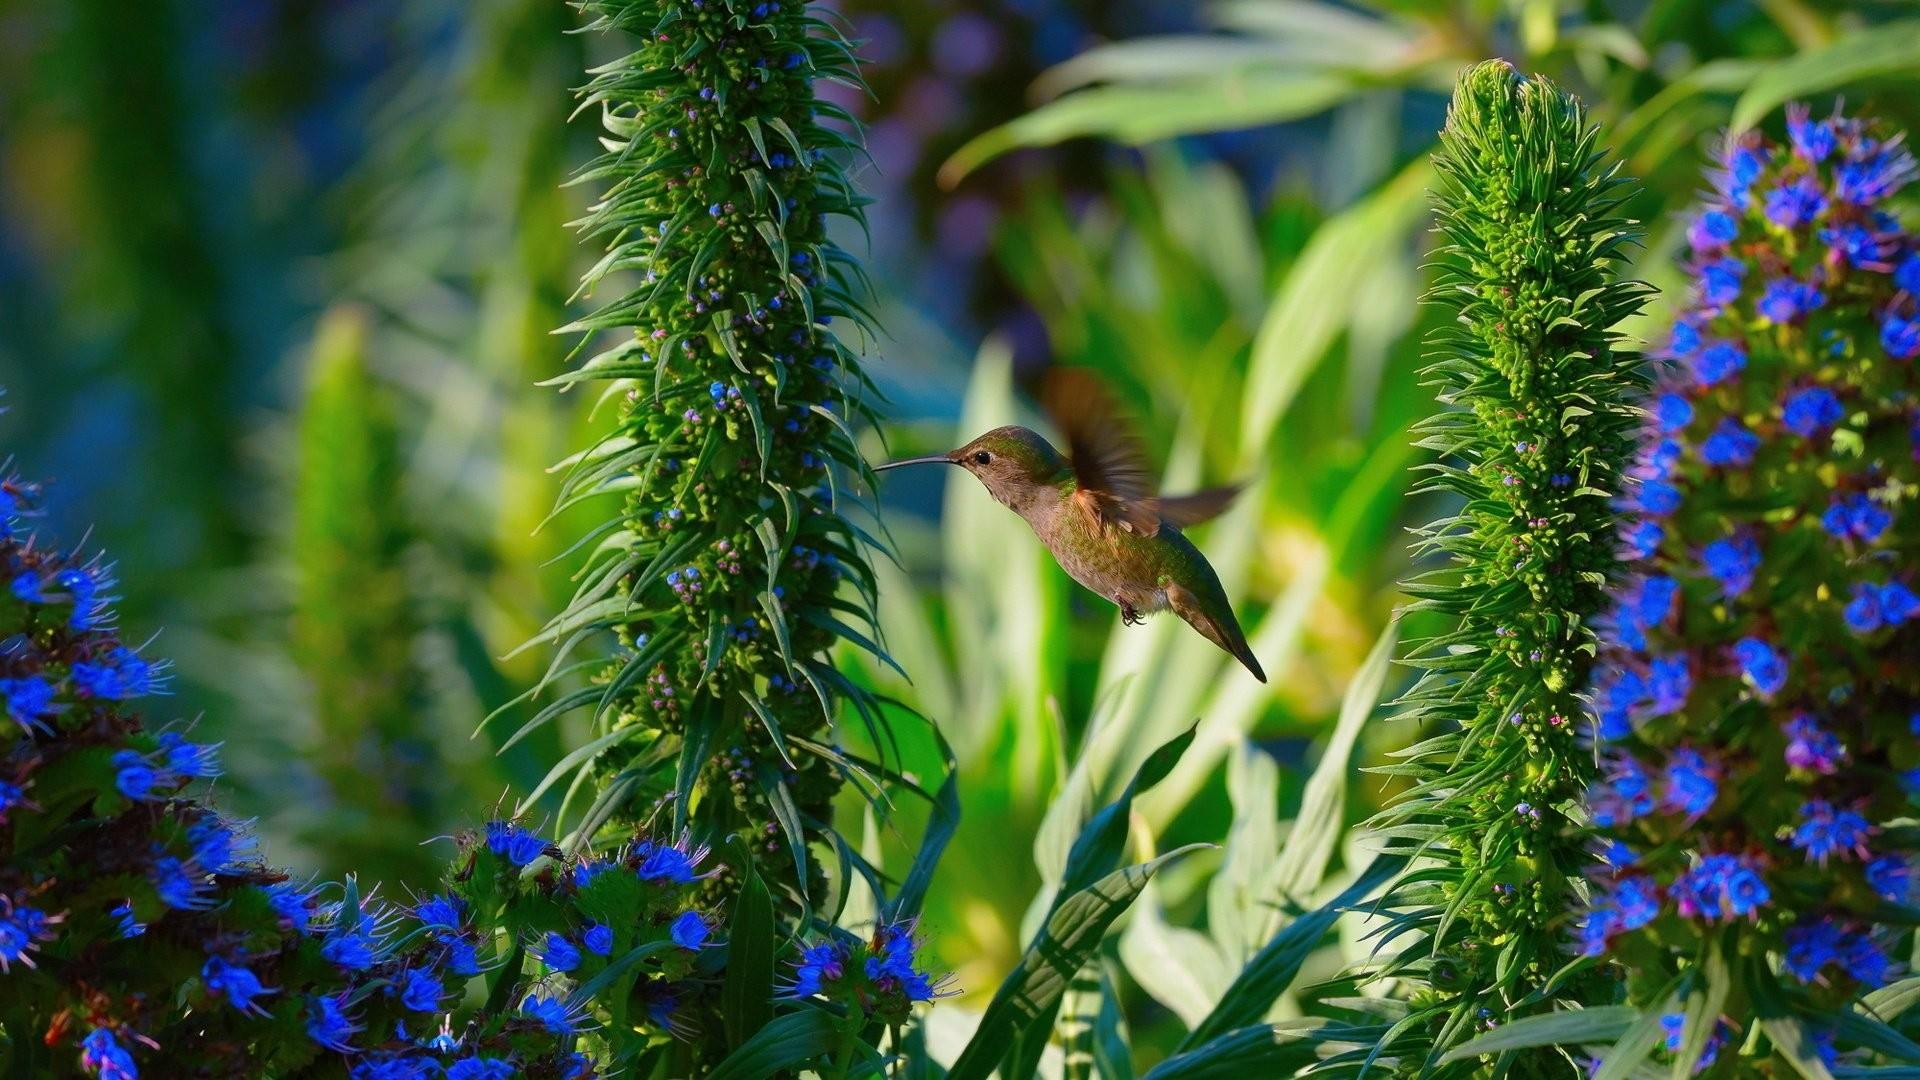 Hummingbird Desktop wallpaper